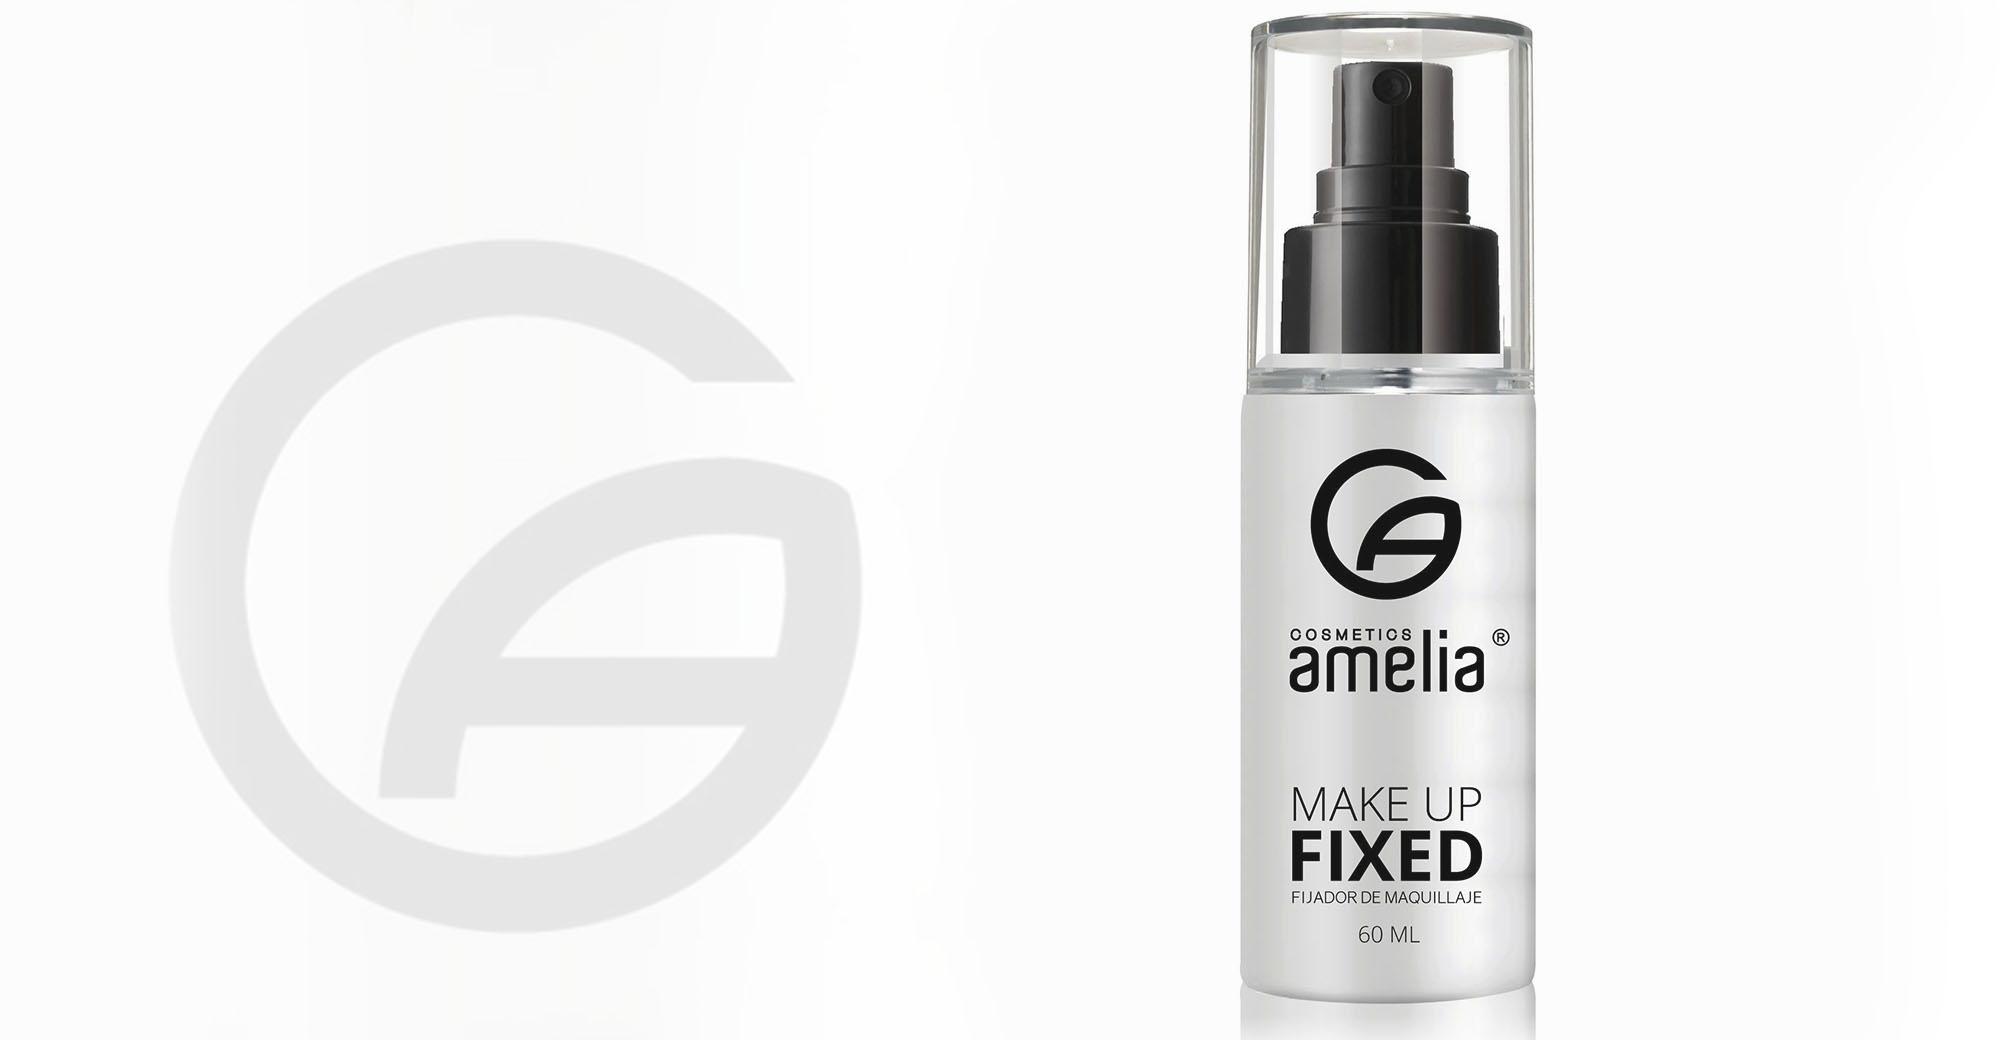 fijador_Amelia_cosmetics tpl